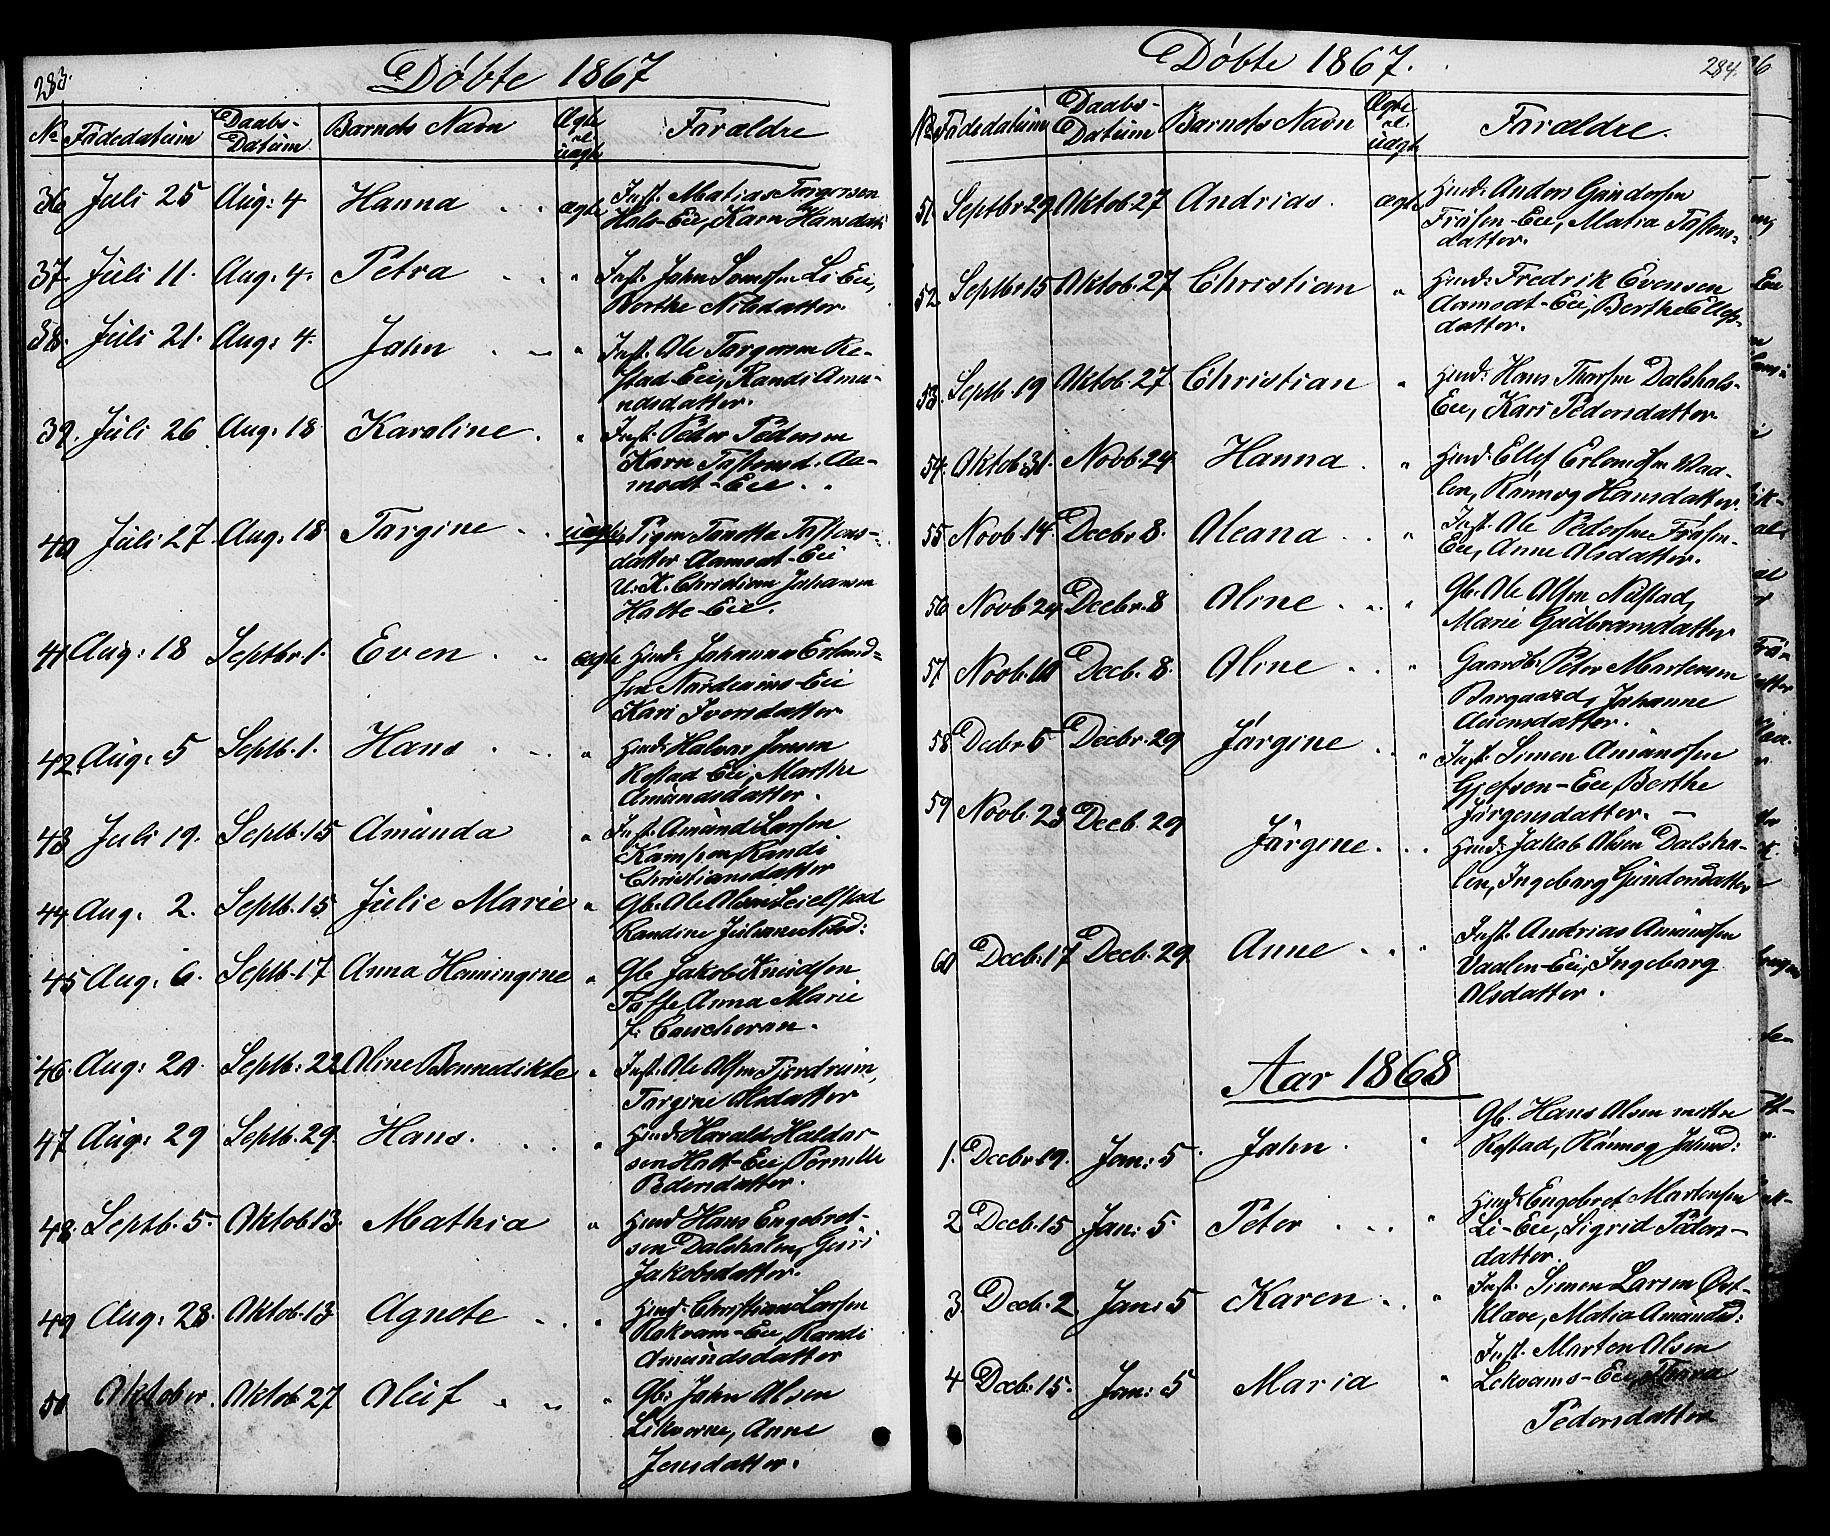 SAH, Østre Gausdal prestekontor, Klokkerbok nr. 1, 1863-1893, s. 283-284